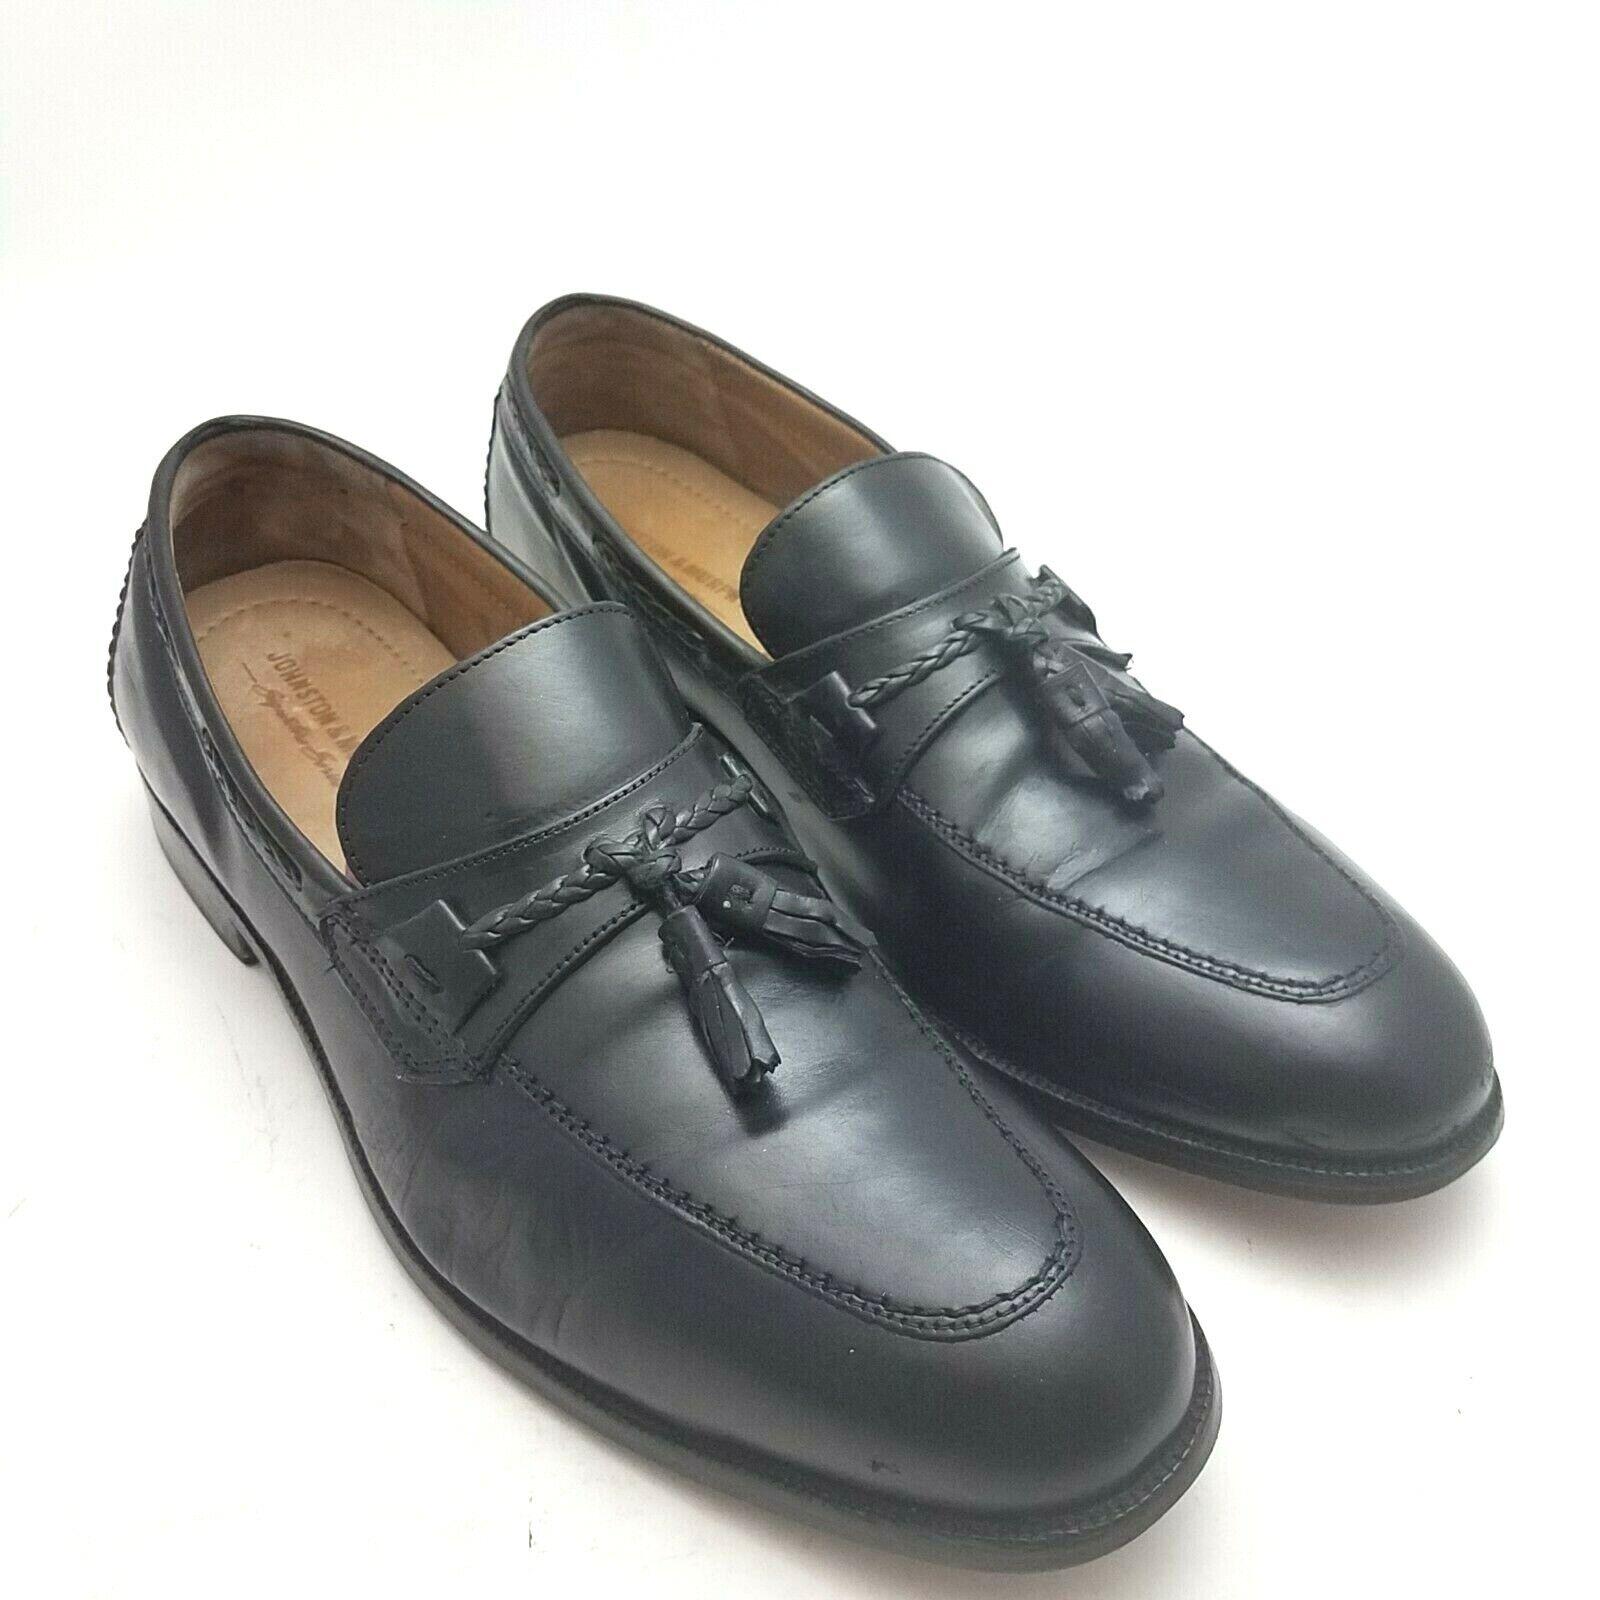 Johnston Murphy Mens Signature Series Loafers Sz 10.5 Black Tassel Dress Shoes